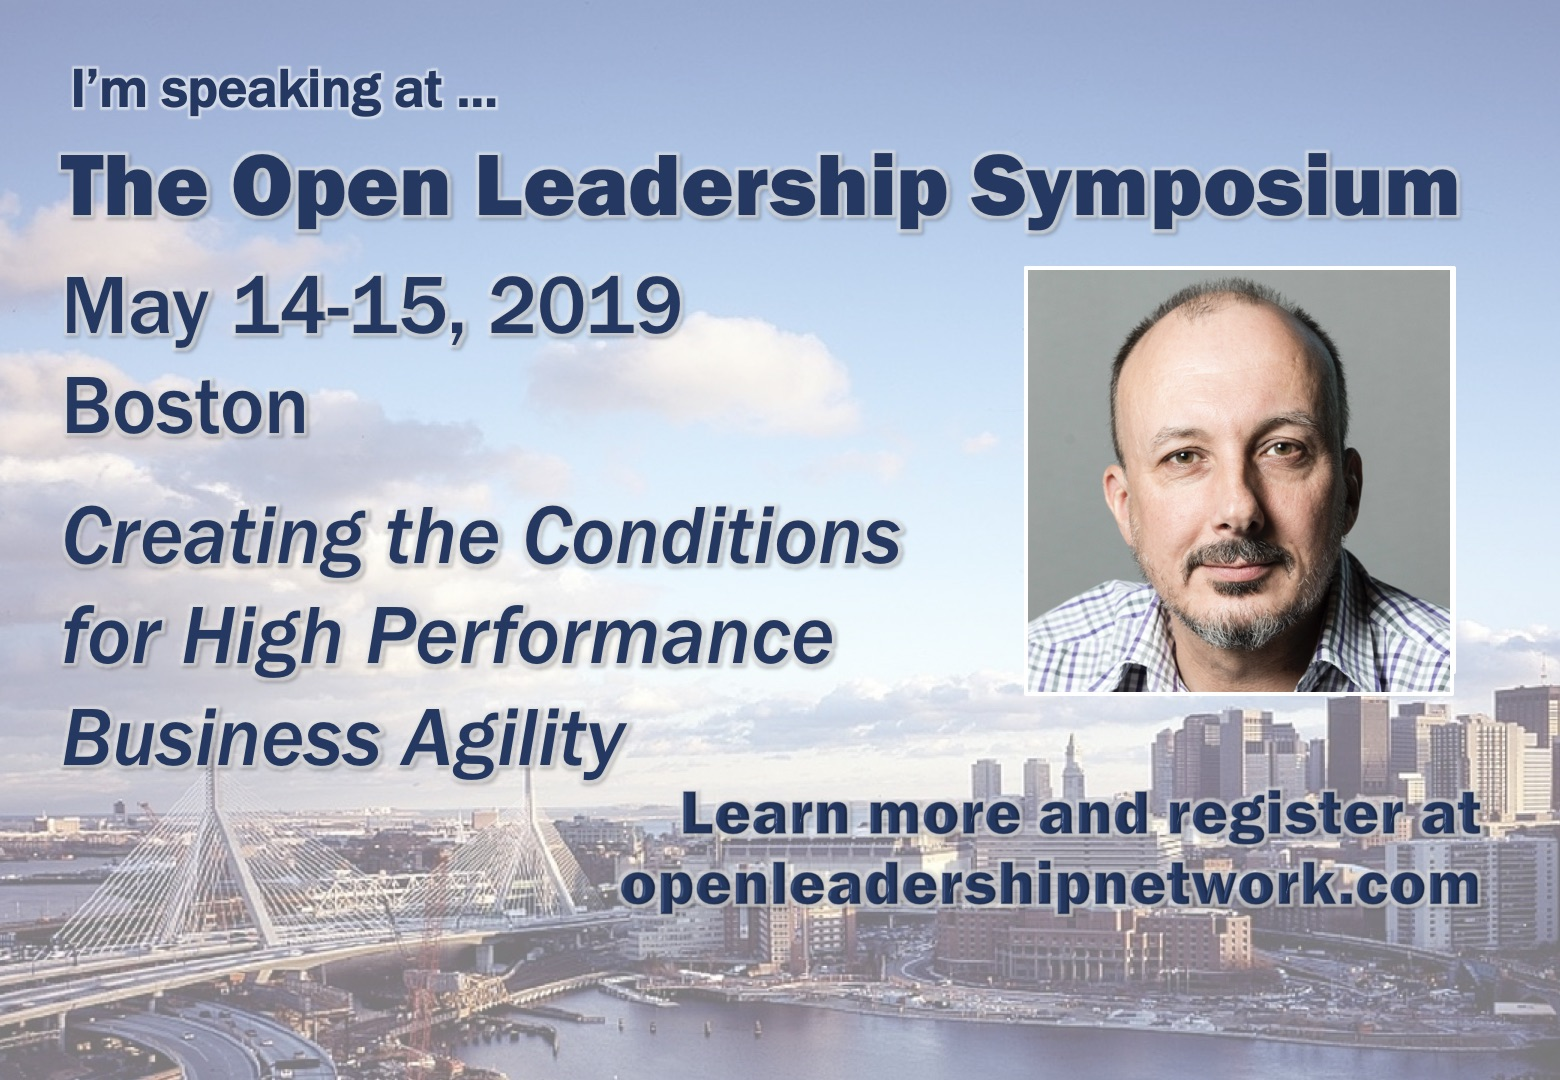 open_leadership_symposium_speaker_burrows